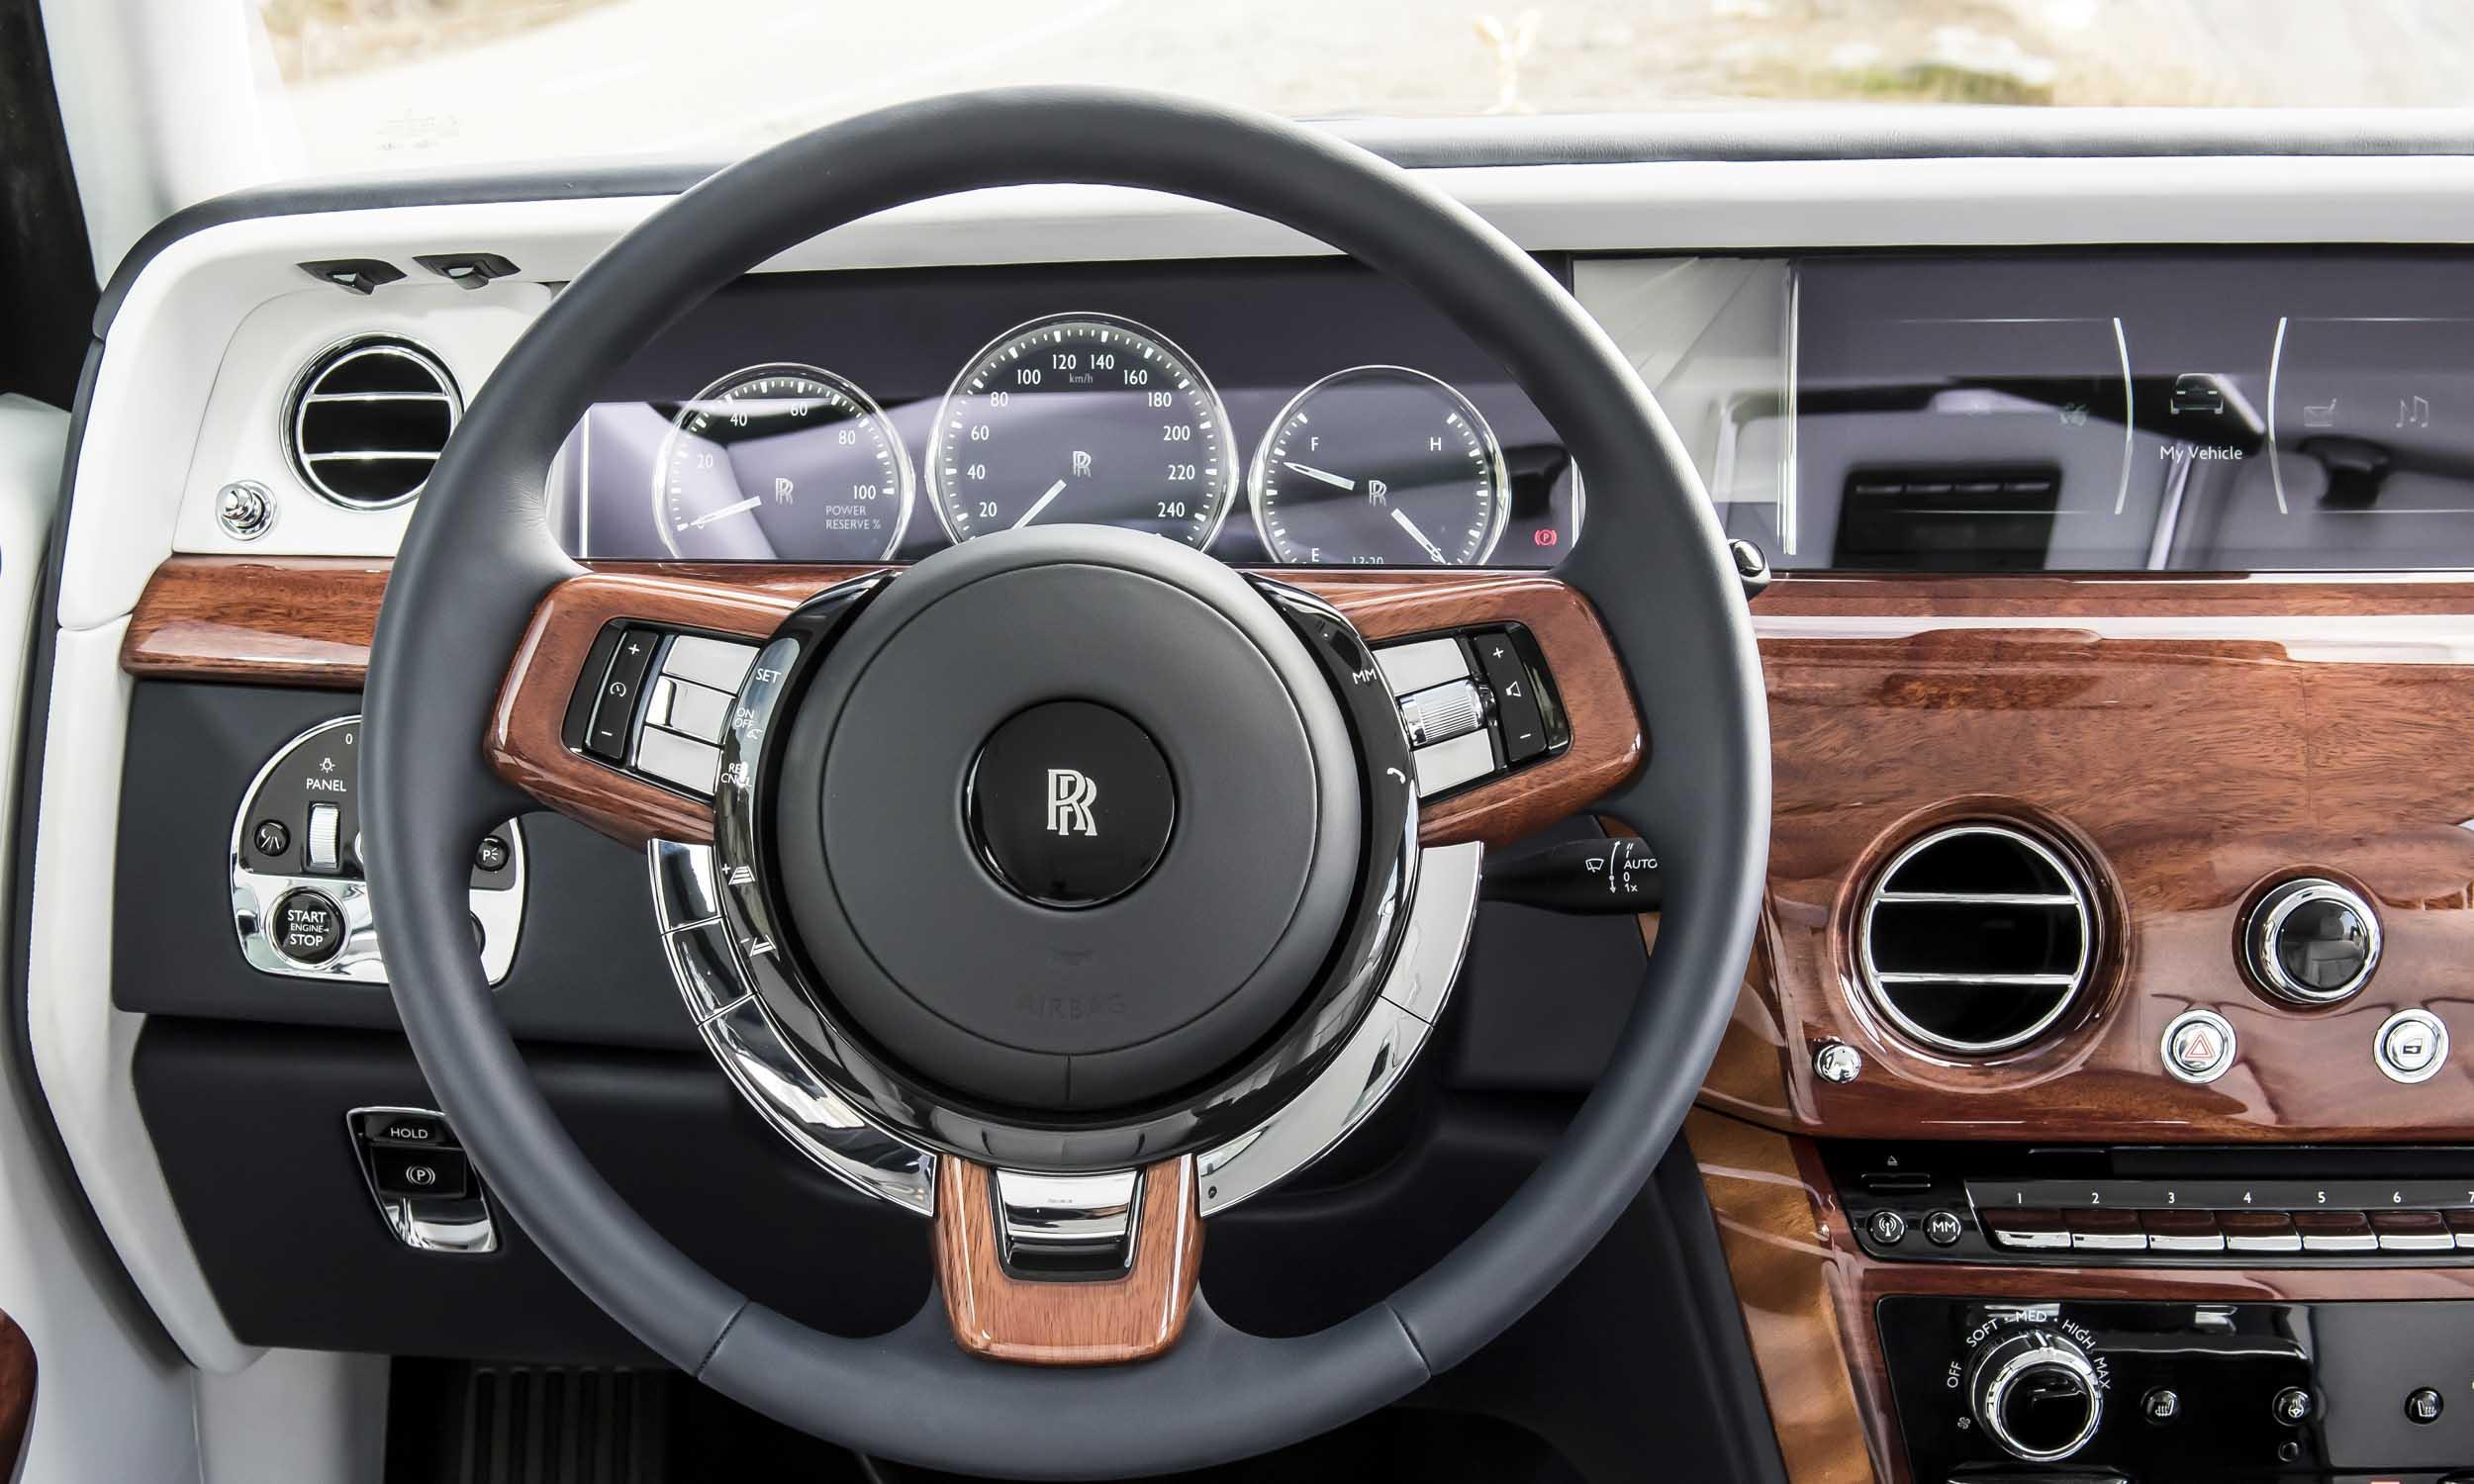 © Rolls-Royce Motor Cars Ltd Photo: James Lipman / jameslipman.com